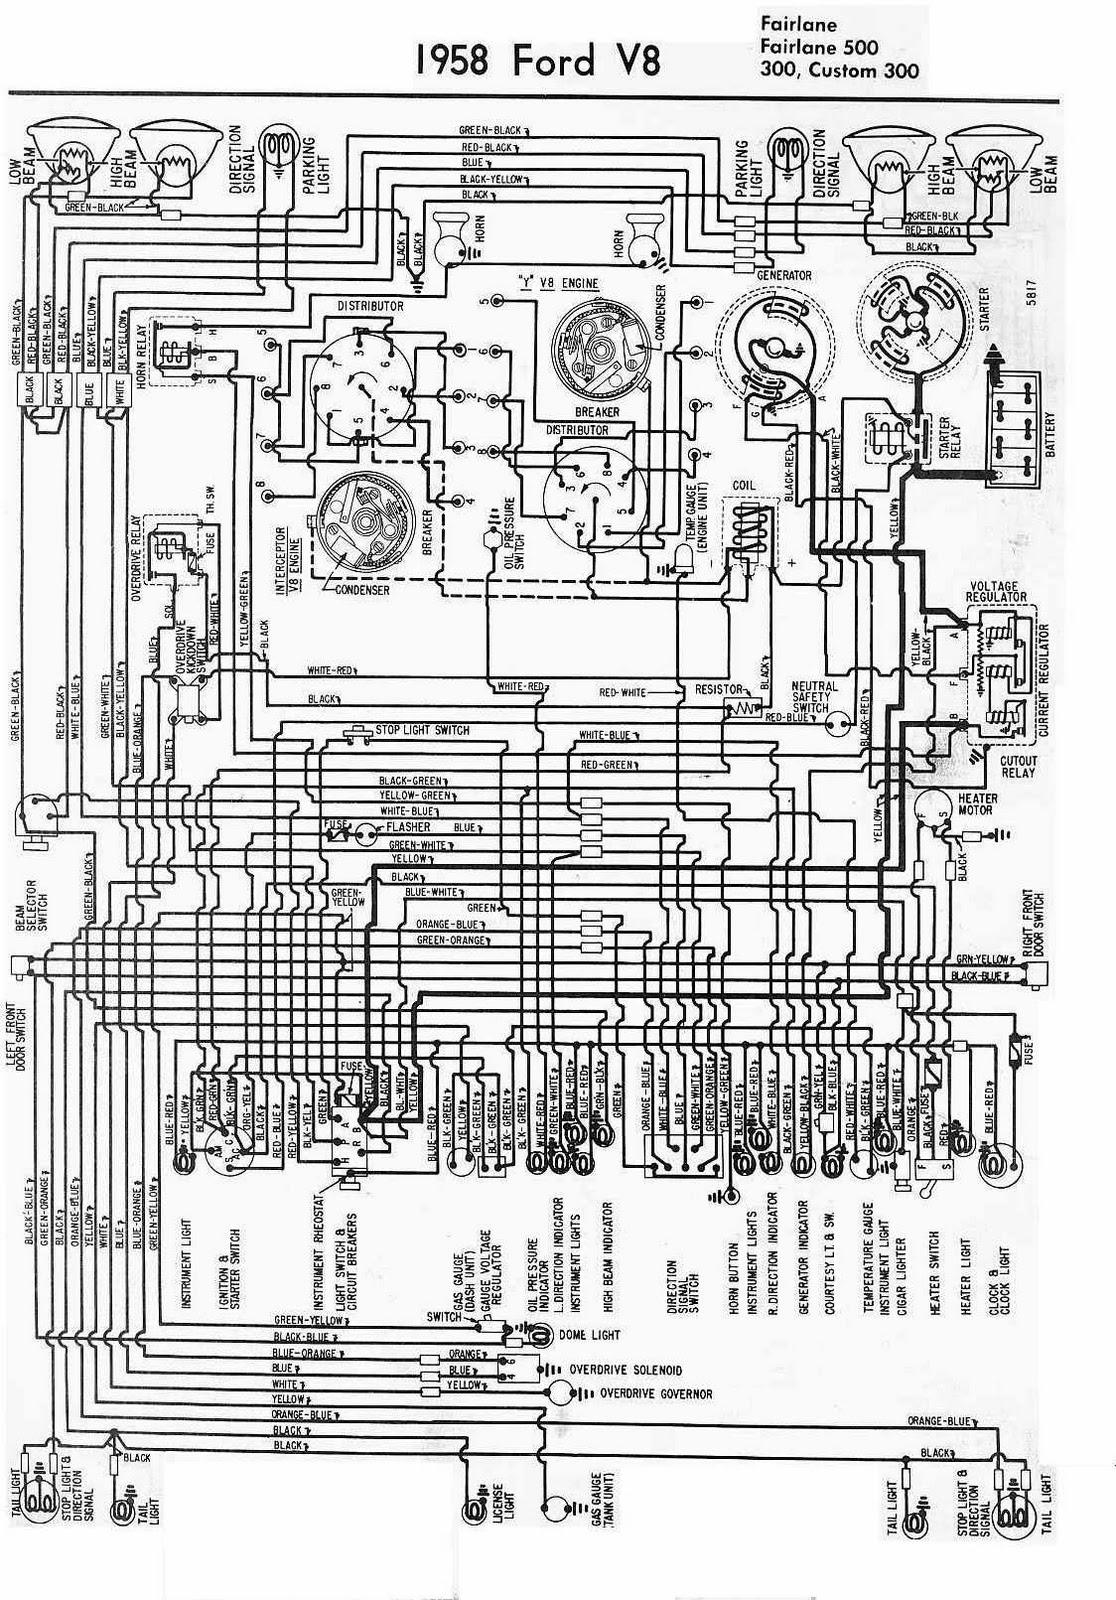 Contemporary 283 Spark Plug Wire Diagram Images - Wiring Diagram ...